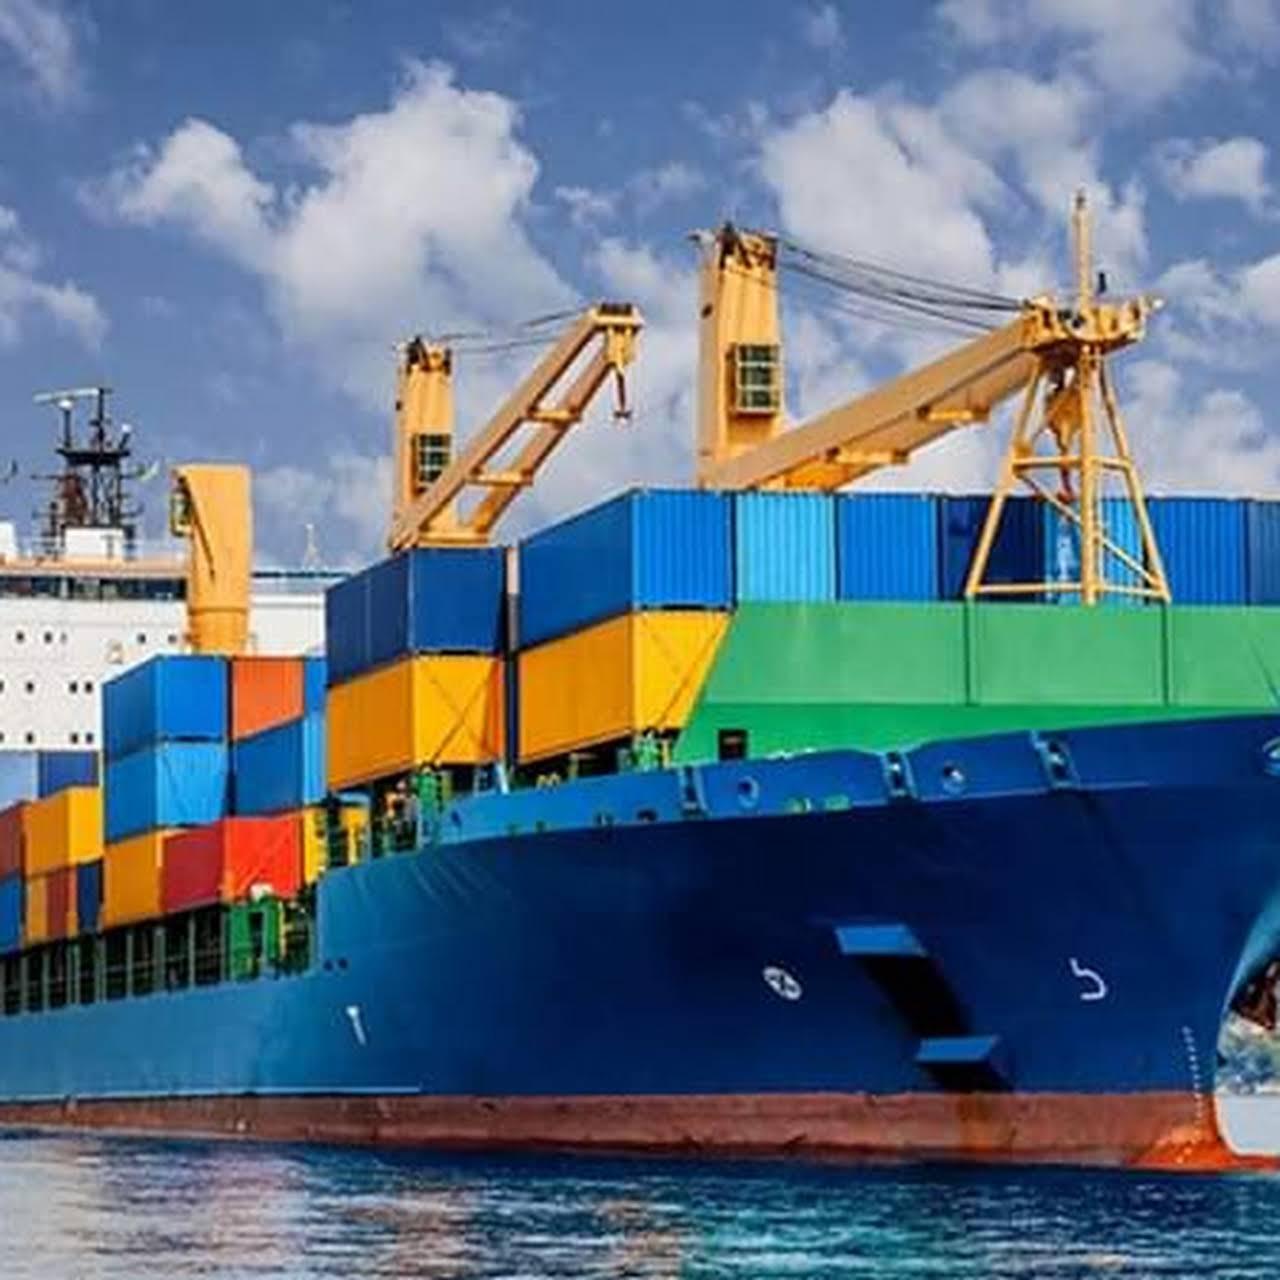 Pakistan Cargo - Shipping Service